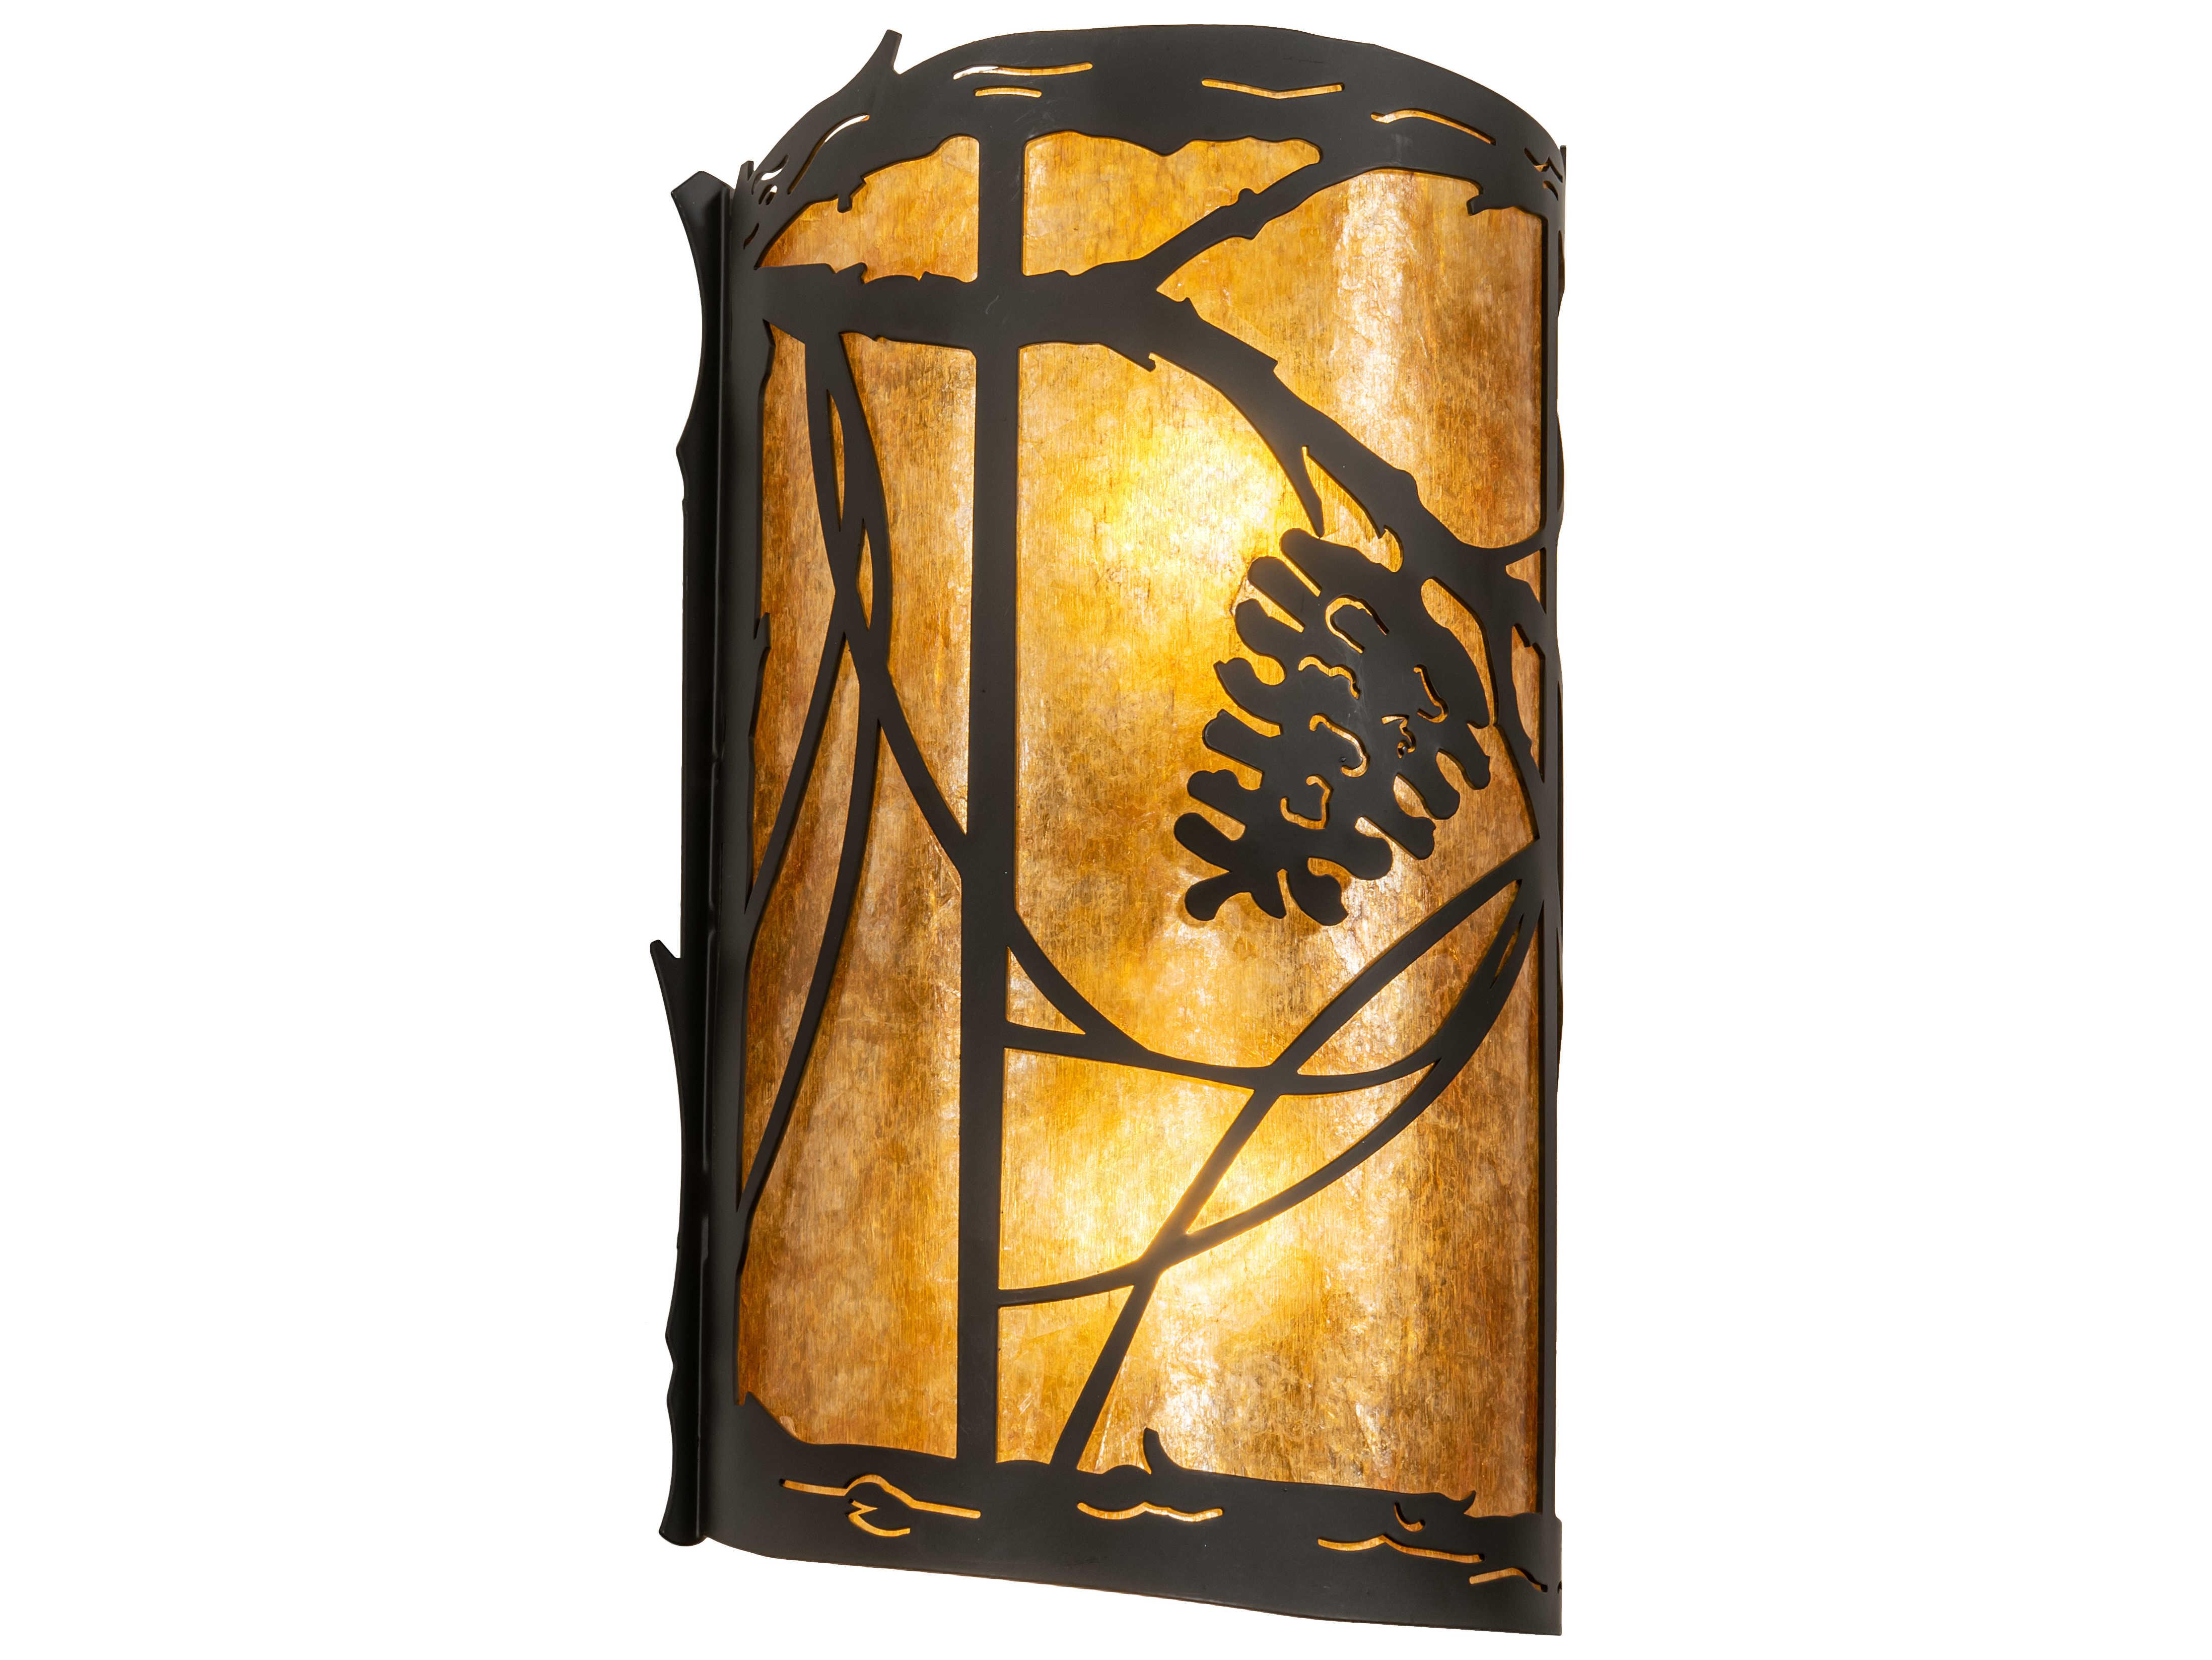 Meyda Whispering Pines Oil Rubbed Bronze 2 Light Rustic Lodge Vanity Light My230825